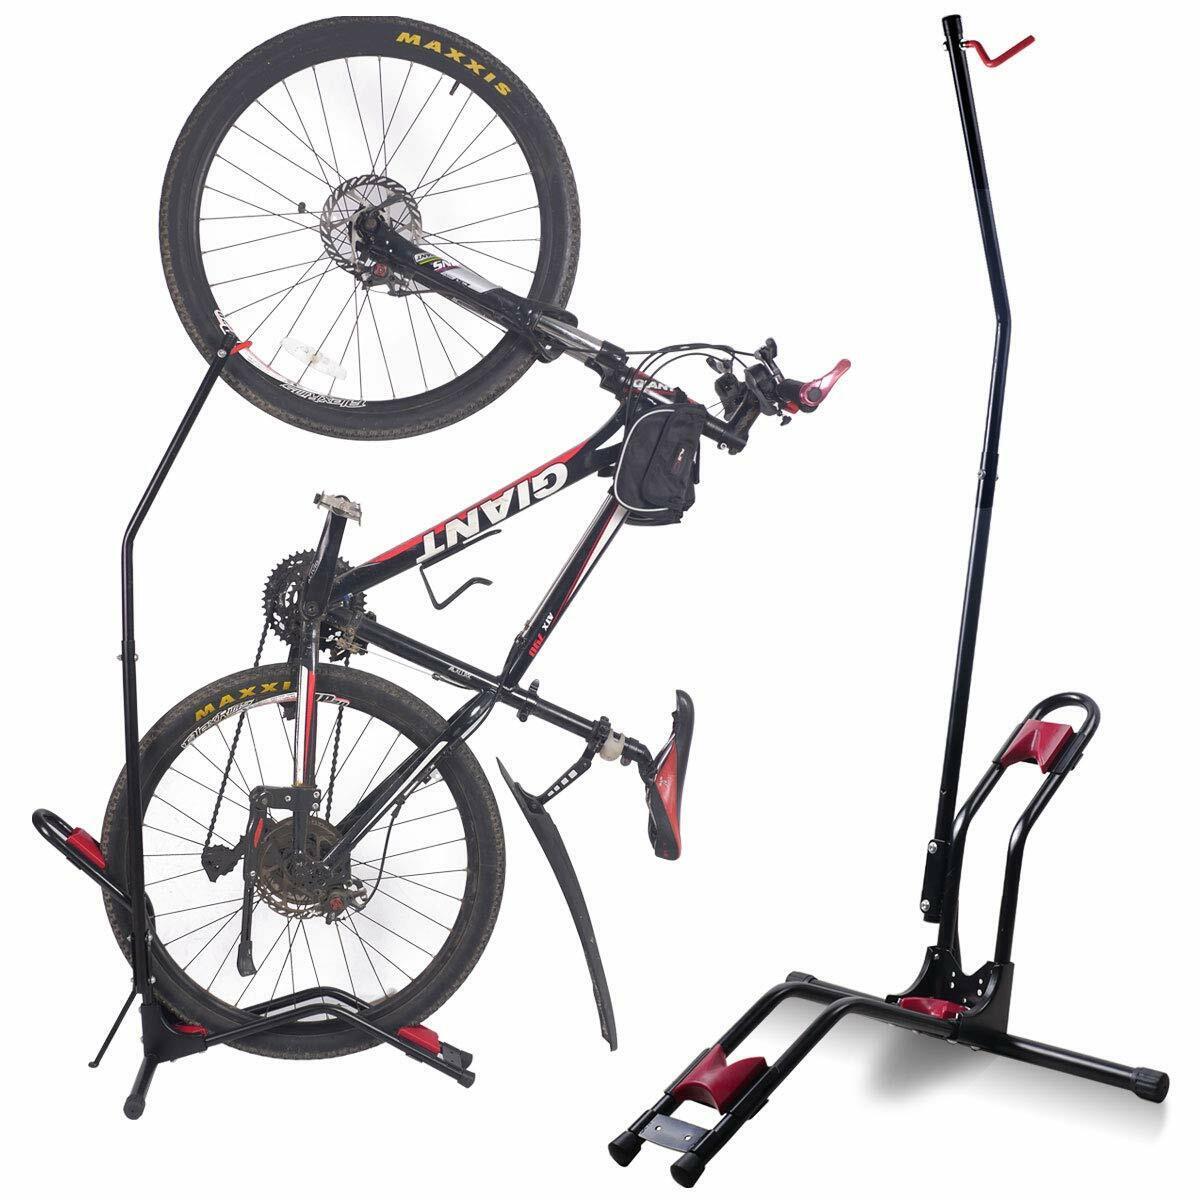 2 X Vélo Crochet neuf support vélo support vélo montage mural Noir